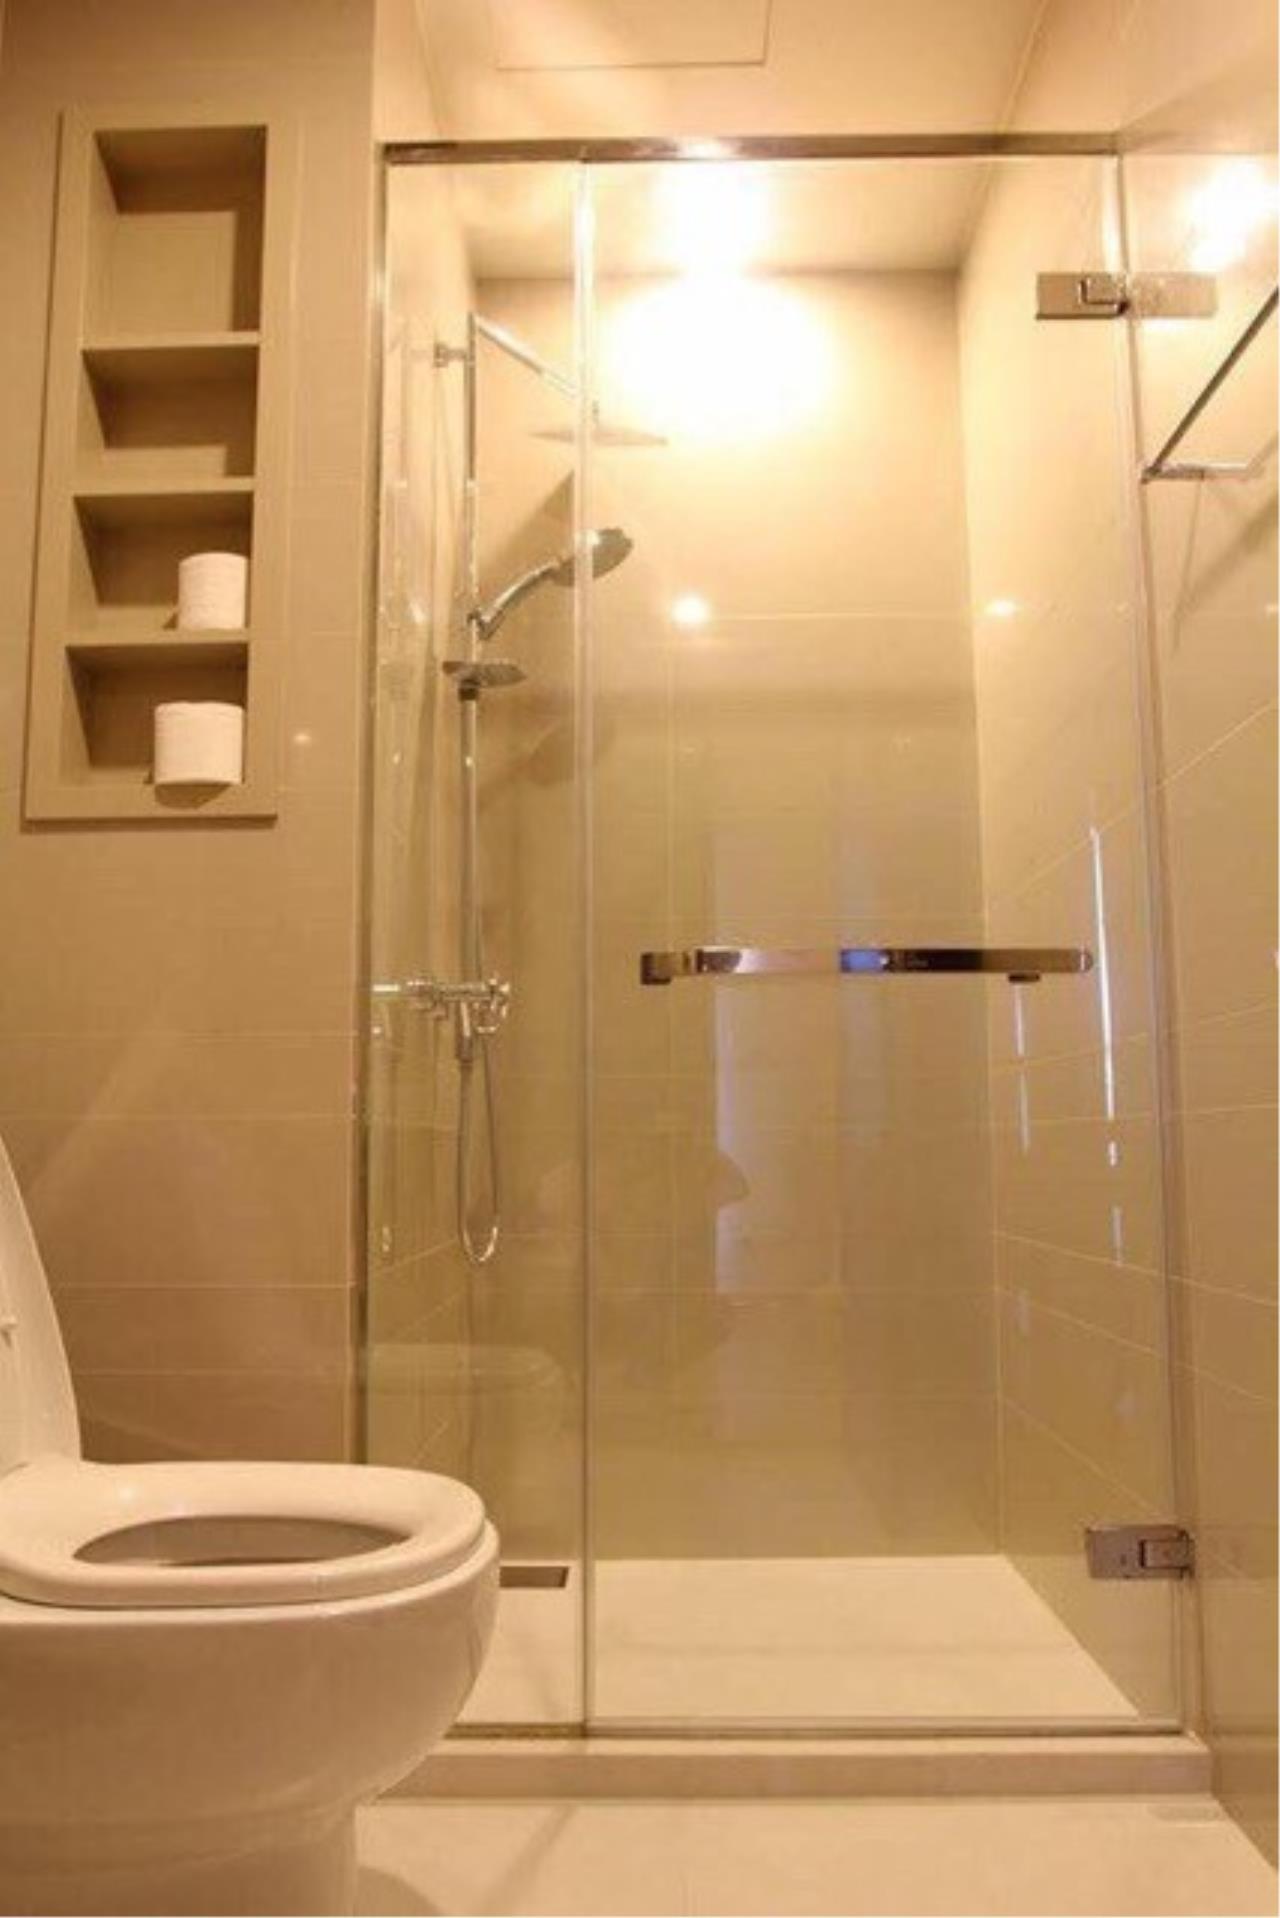 Piri Property Agency's 2 bedrooms Condominium  on 12A floor For Rent 2 5